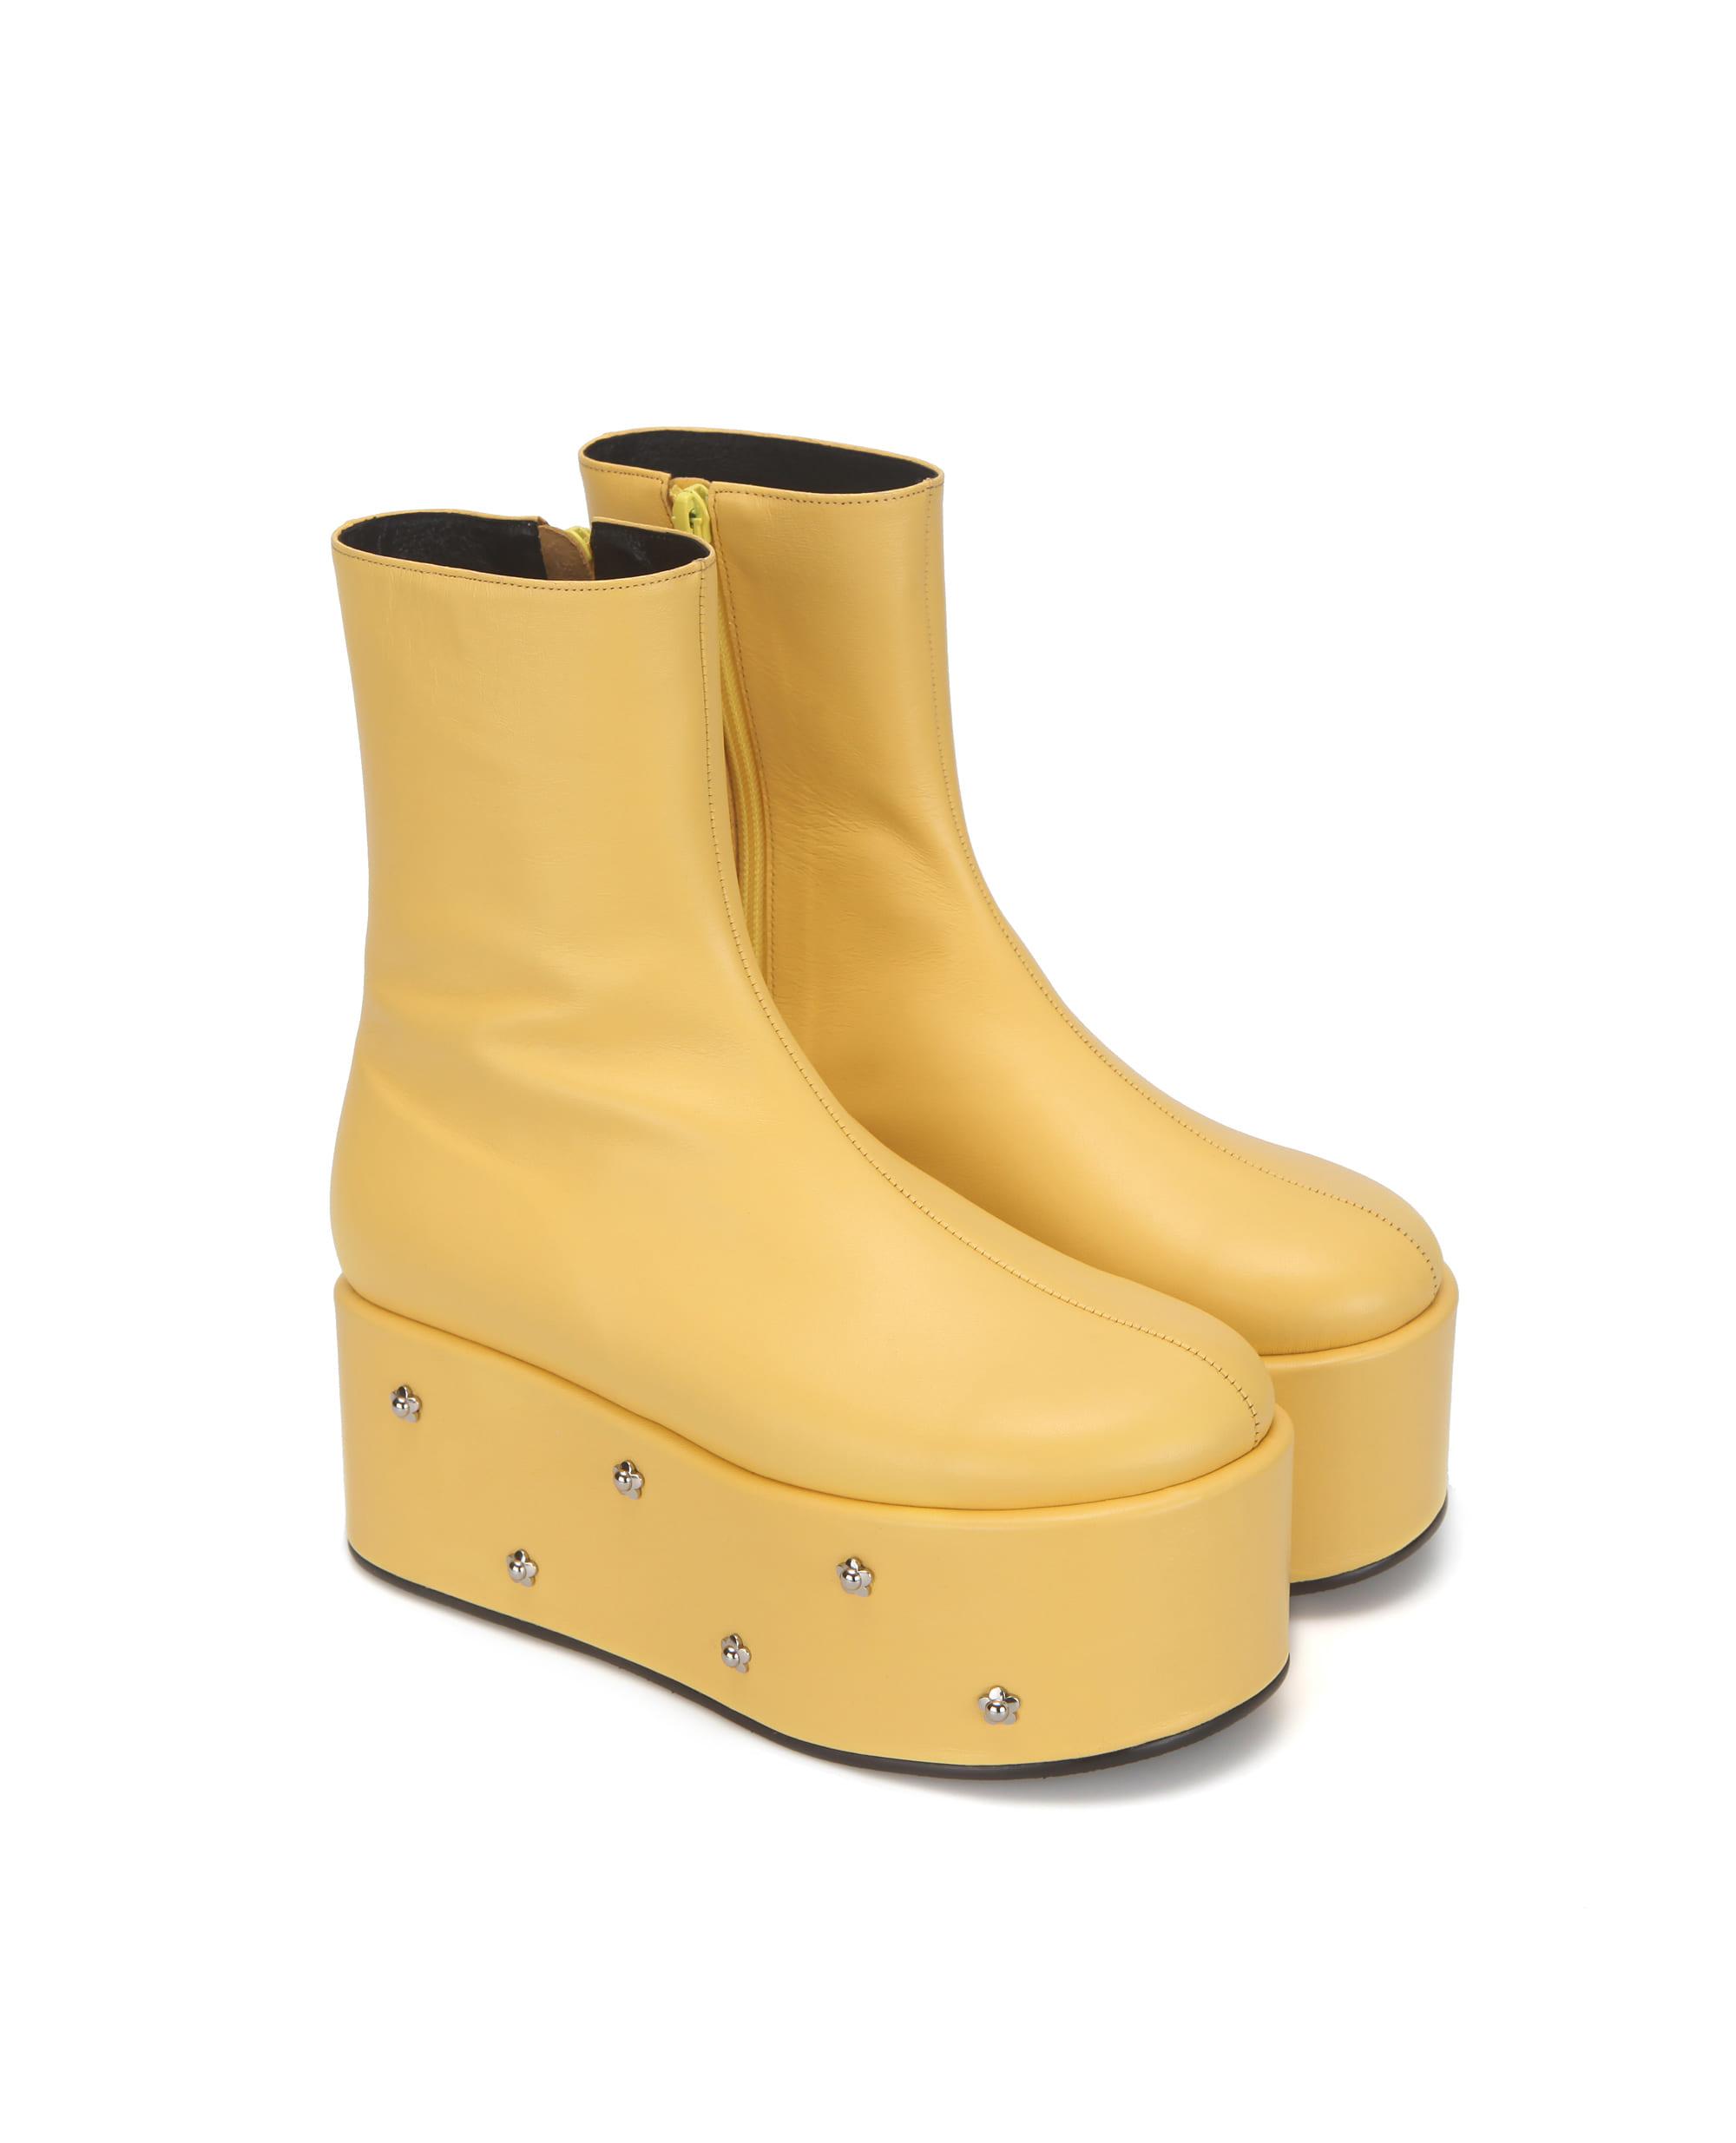 Pebble toe flower platform boots | Yellow